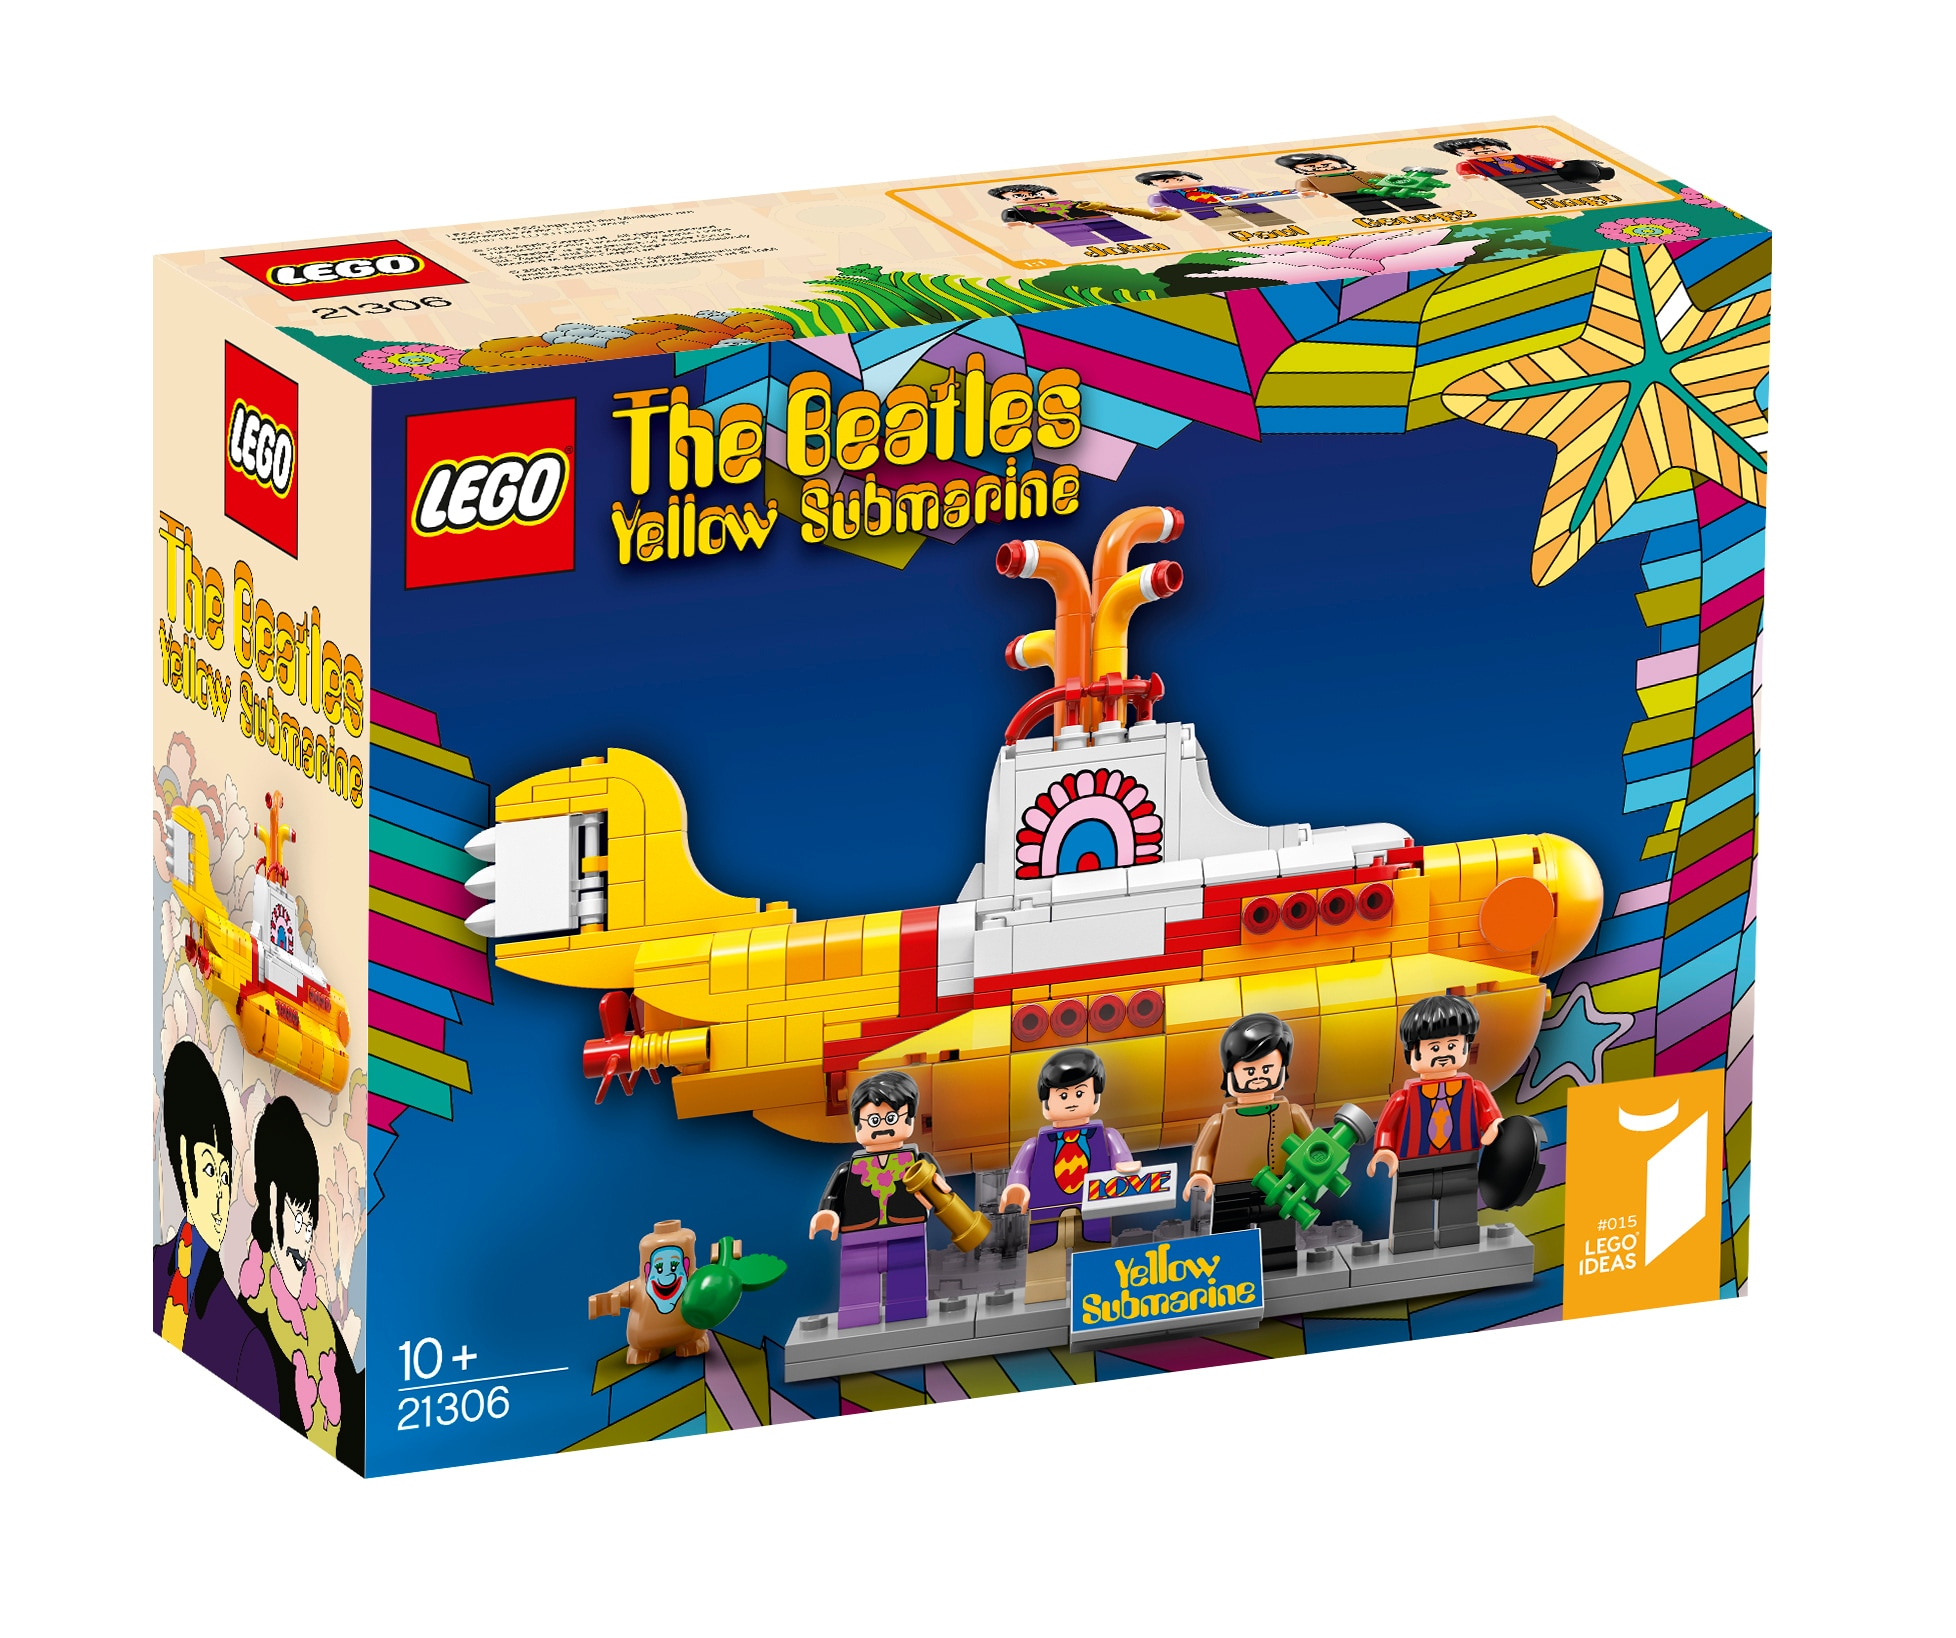 LEGO Yellow Submarine The Beatles – 3